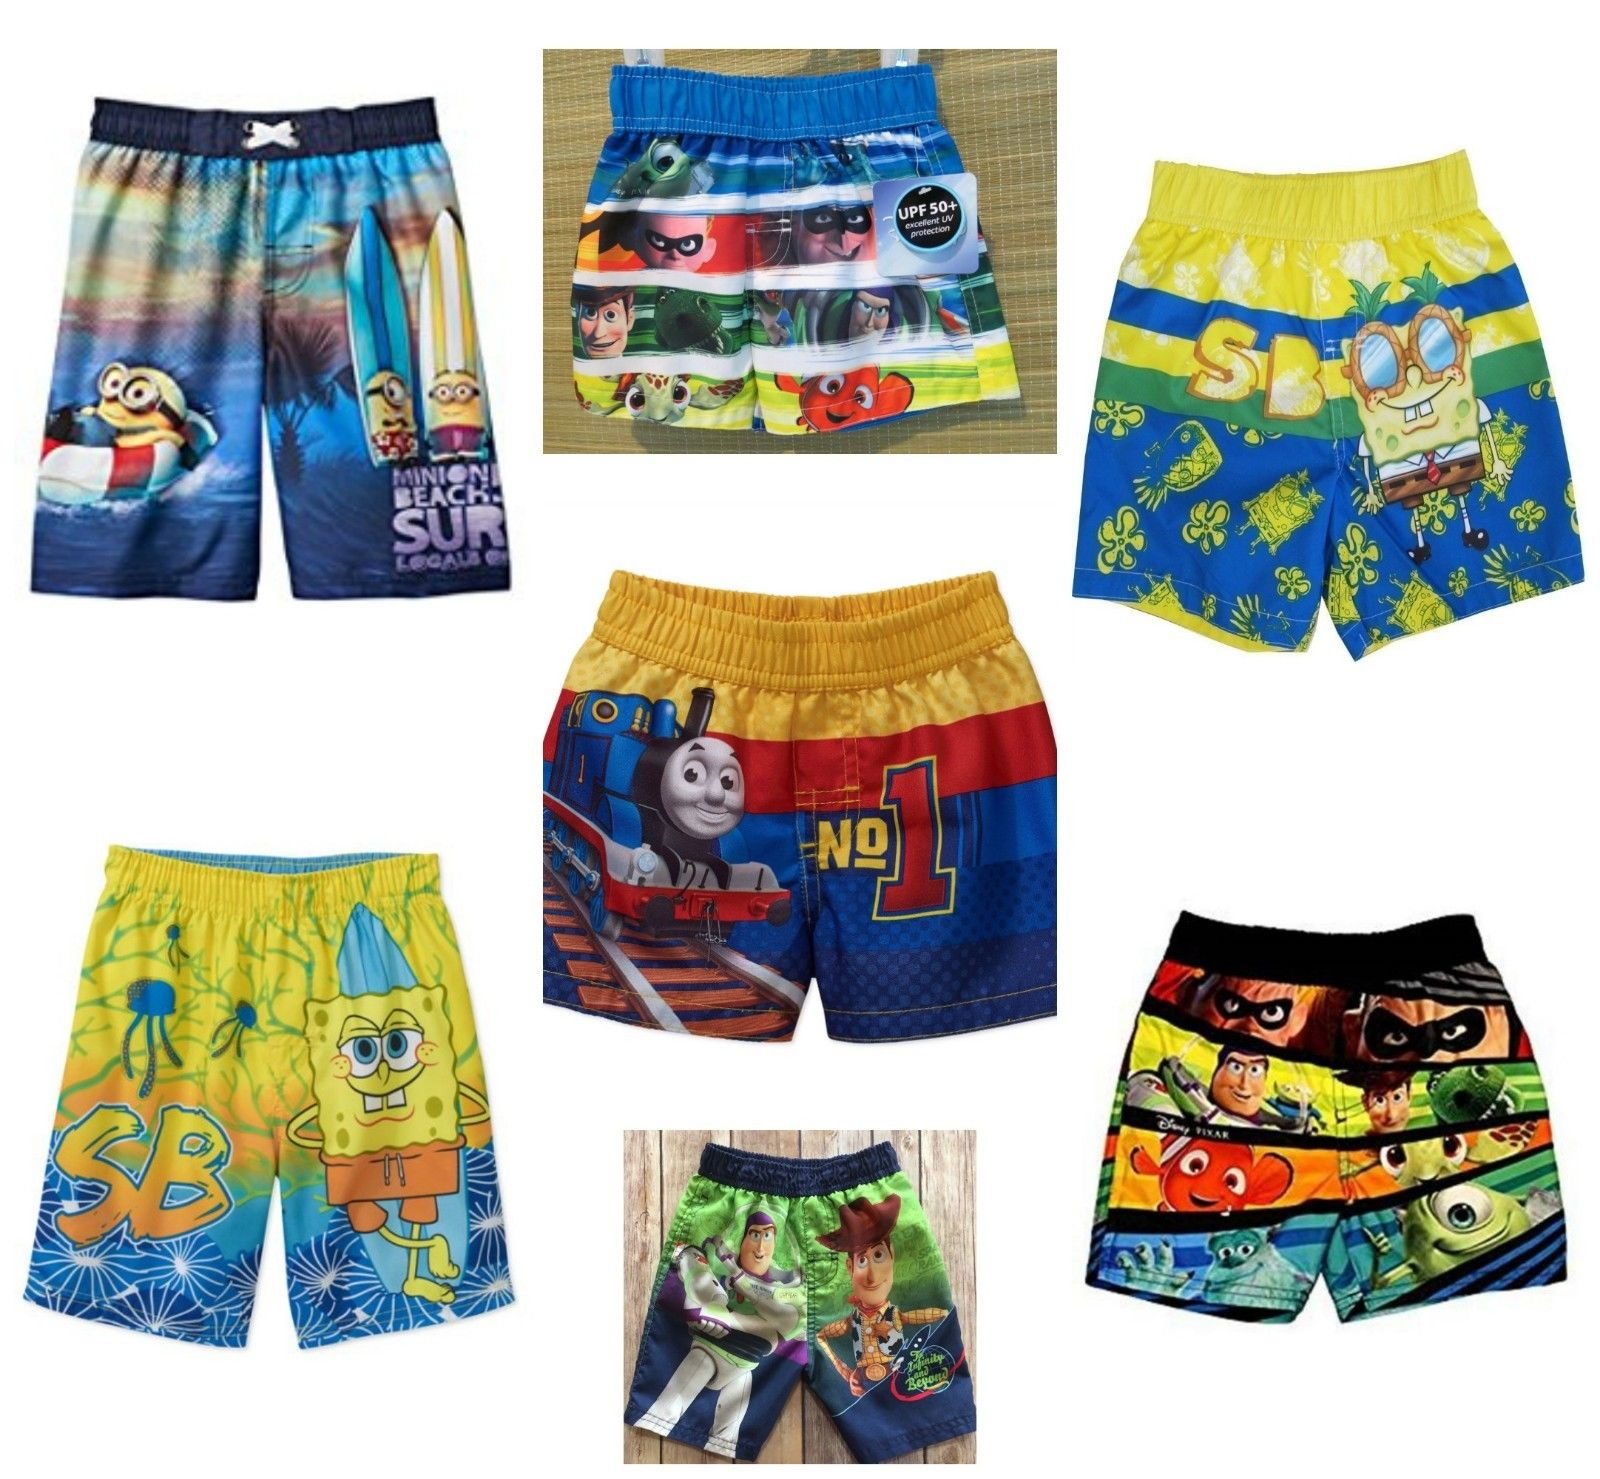 89549bdd89 $10.99 - Boys Toddler Swim Trunks Spongebob Minion Buzz Woody Dory Monster  Inc Thomas Nwt #ebay #Fashion